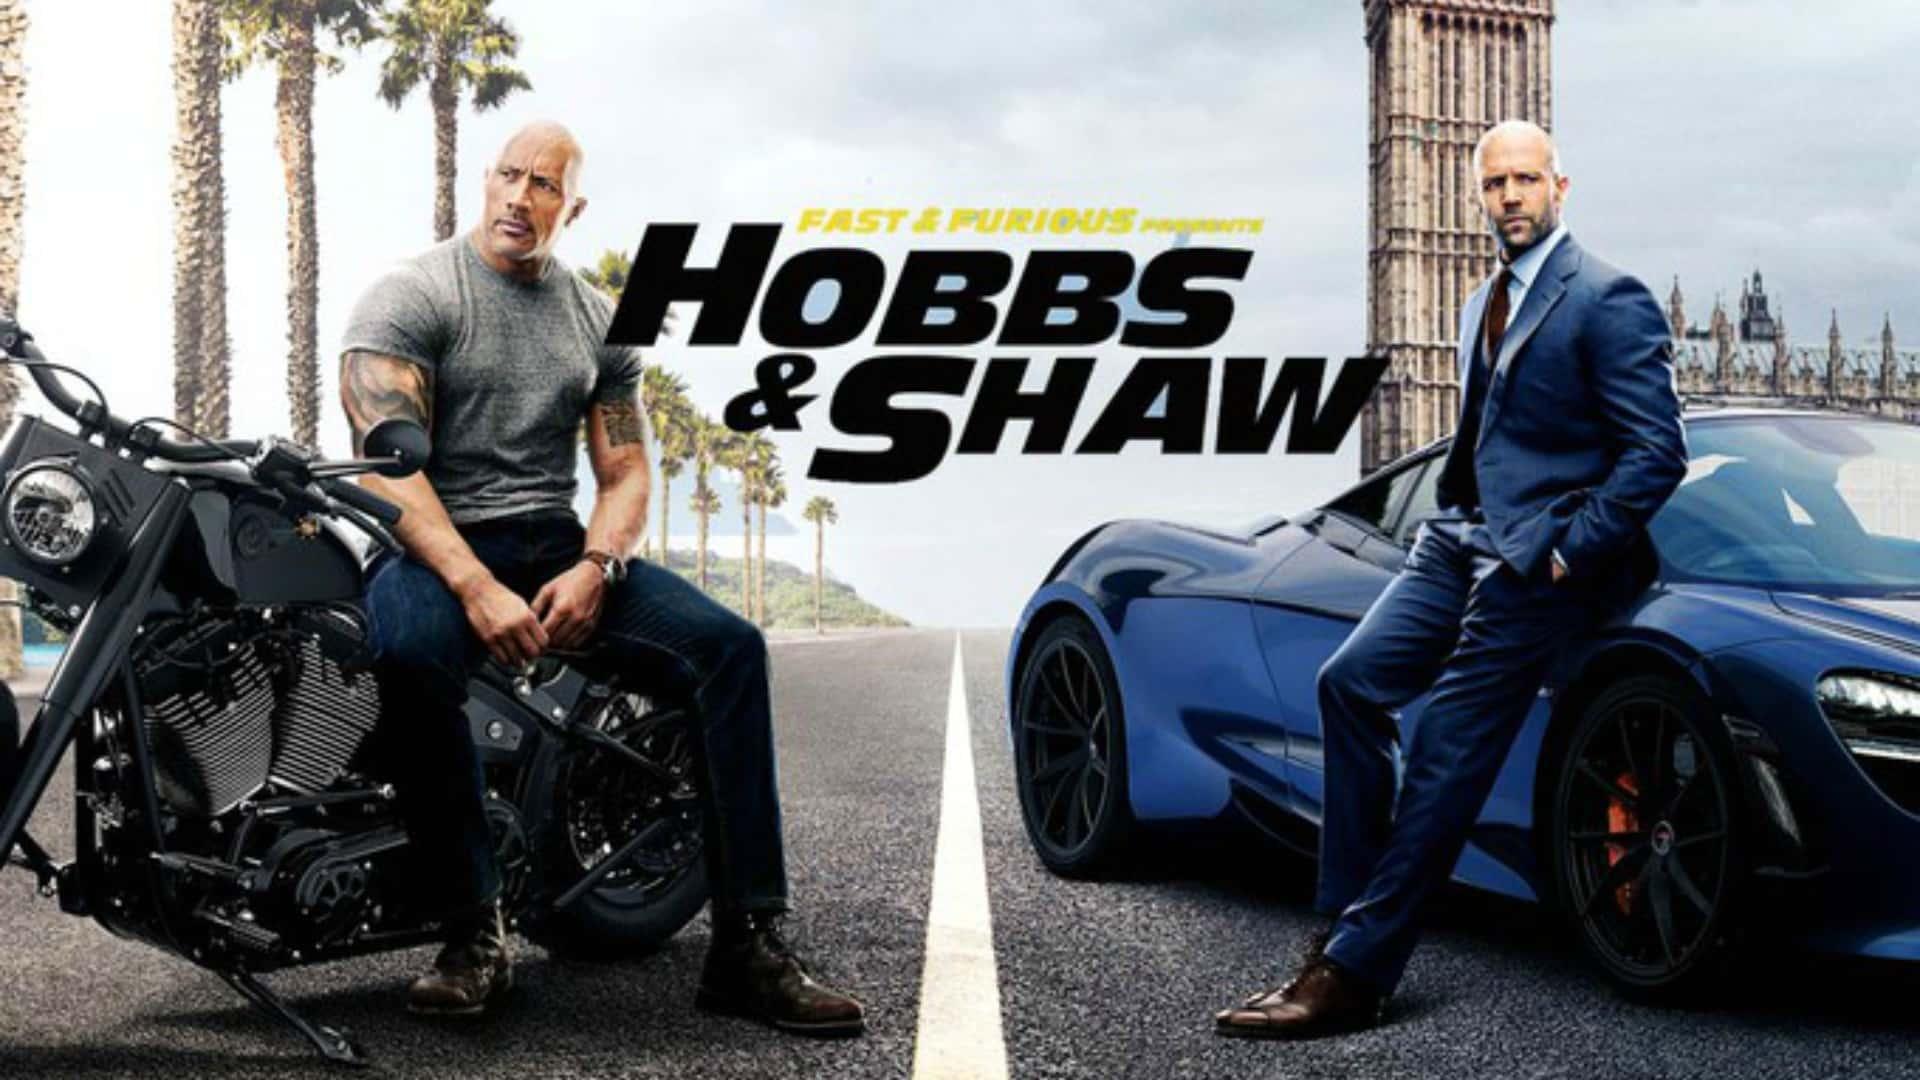 Hobbs & Shaw, cinematographe.it